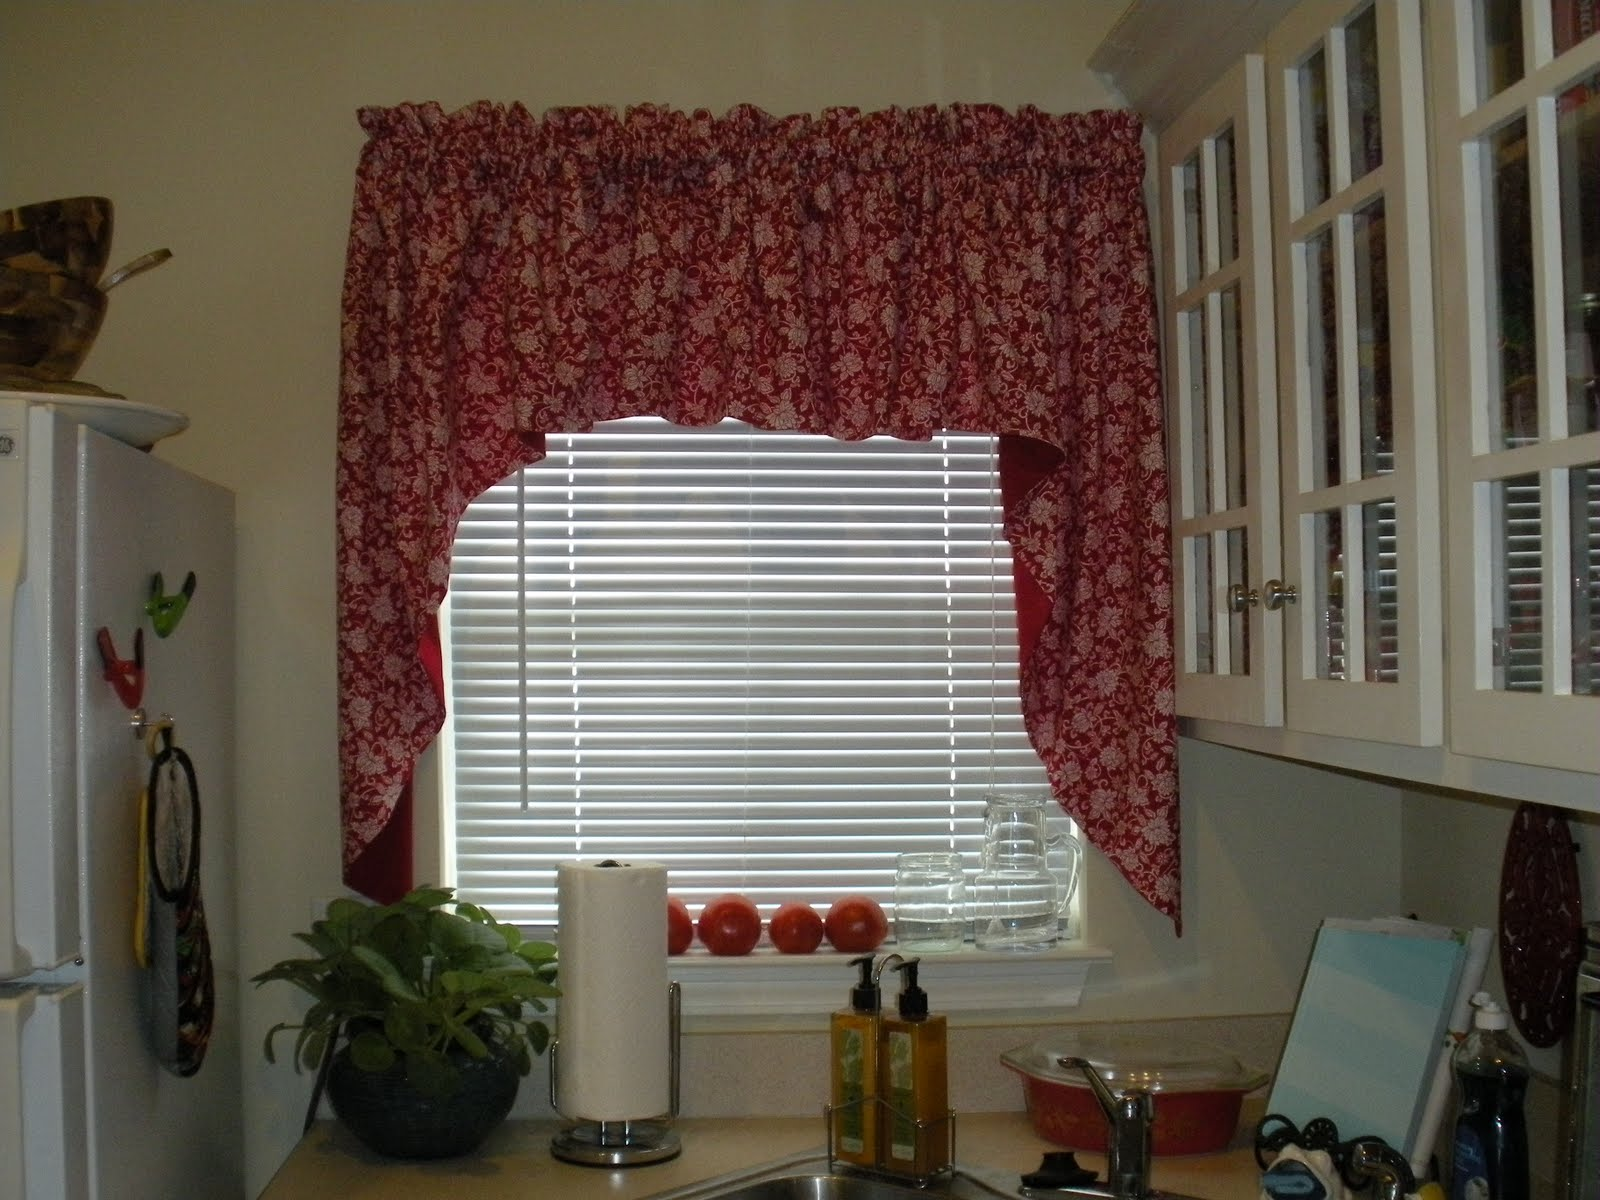 Kitchen Window Curtains Ventilator Joe And Melody October 2009